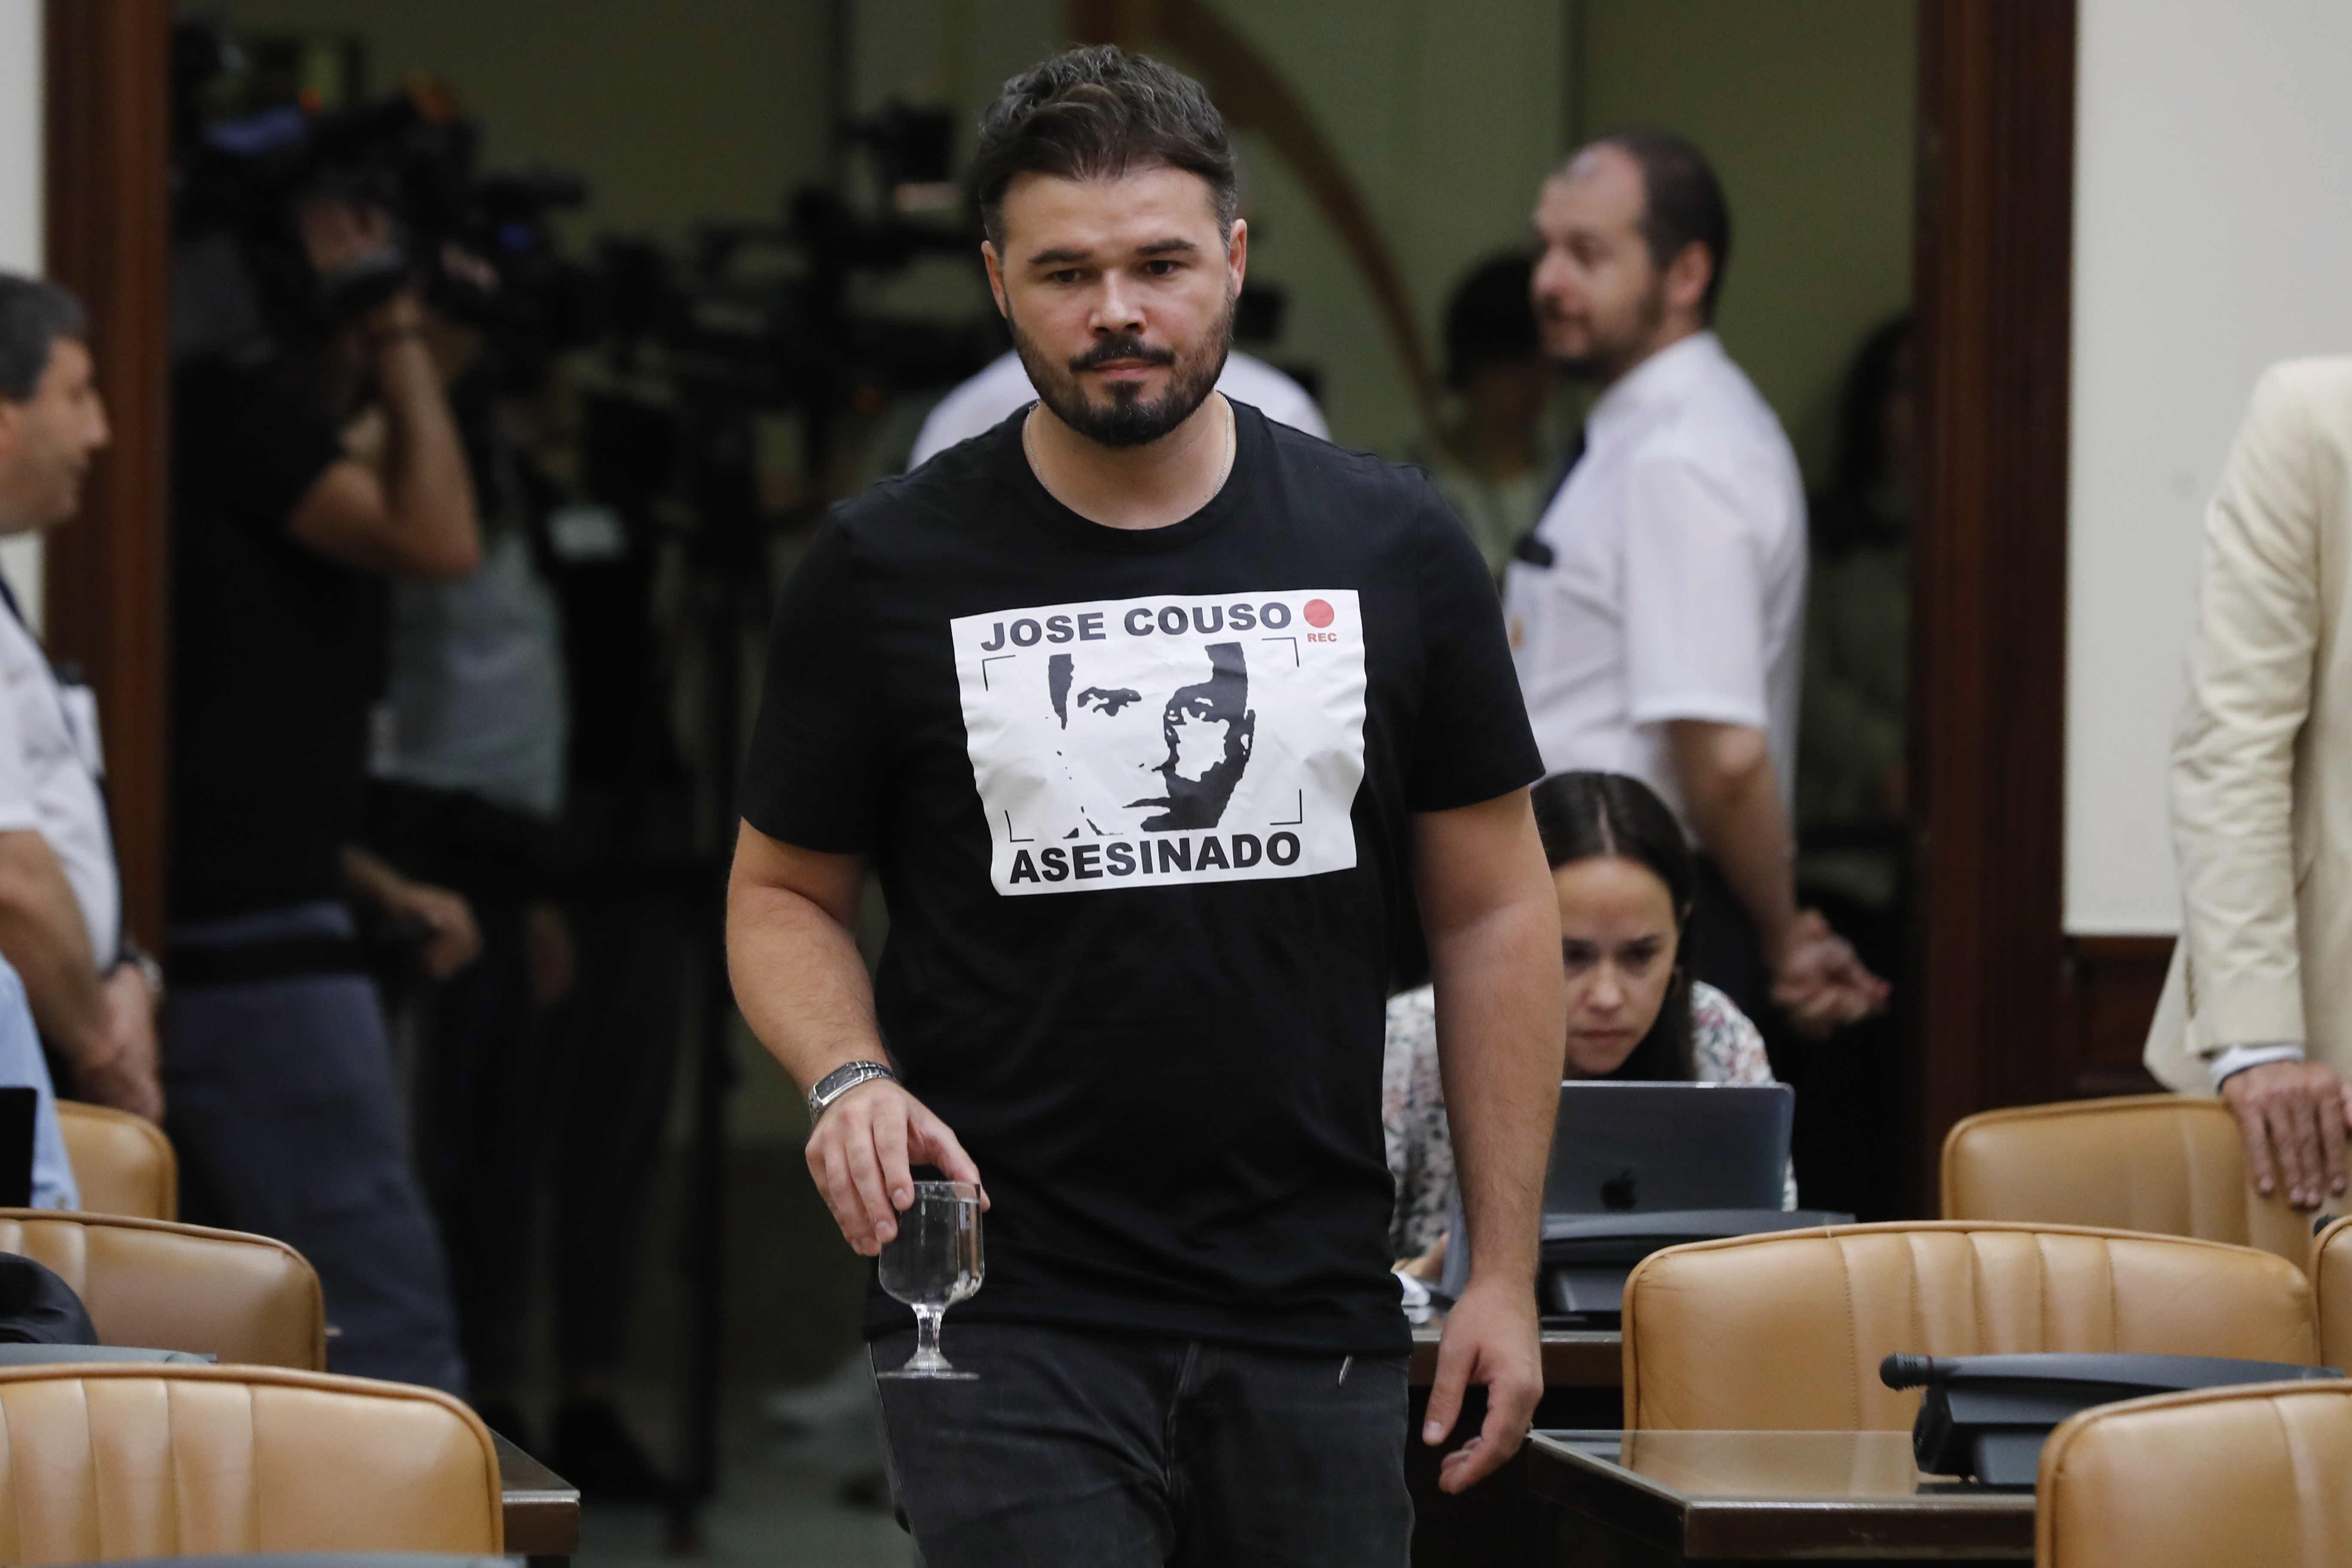 Rufián compares former PM Aznar to Vito Corleone in the Congress